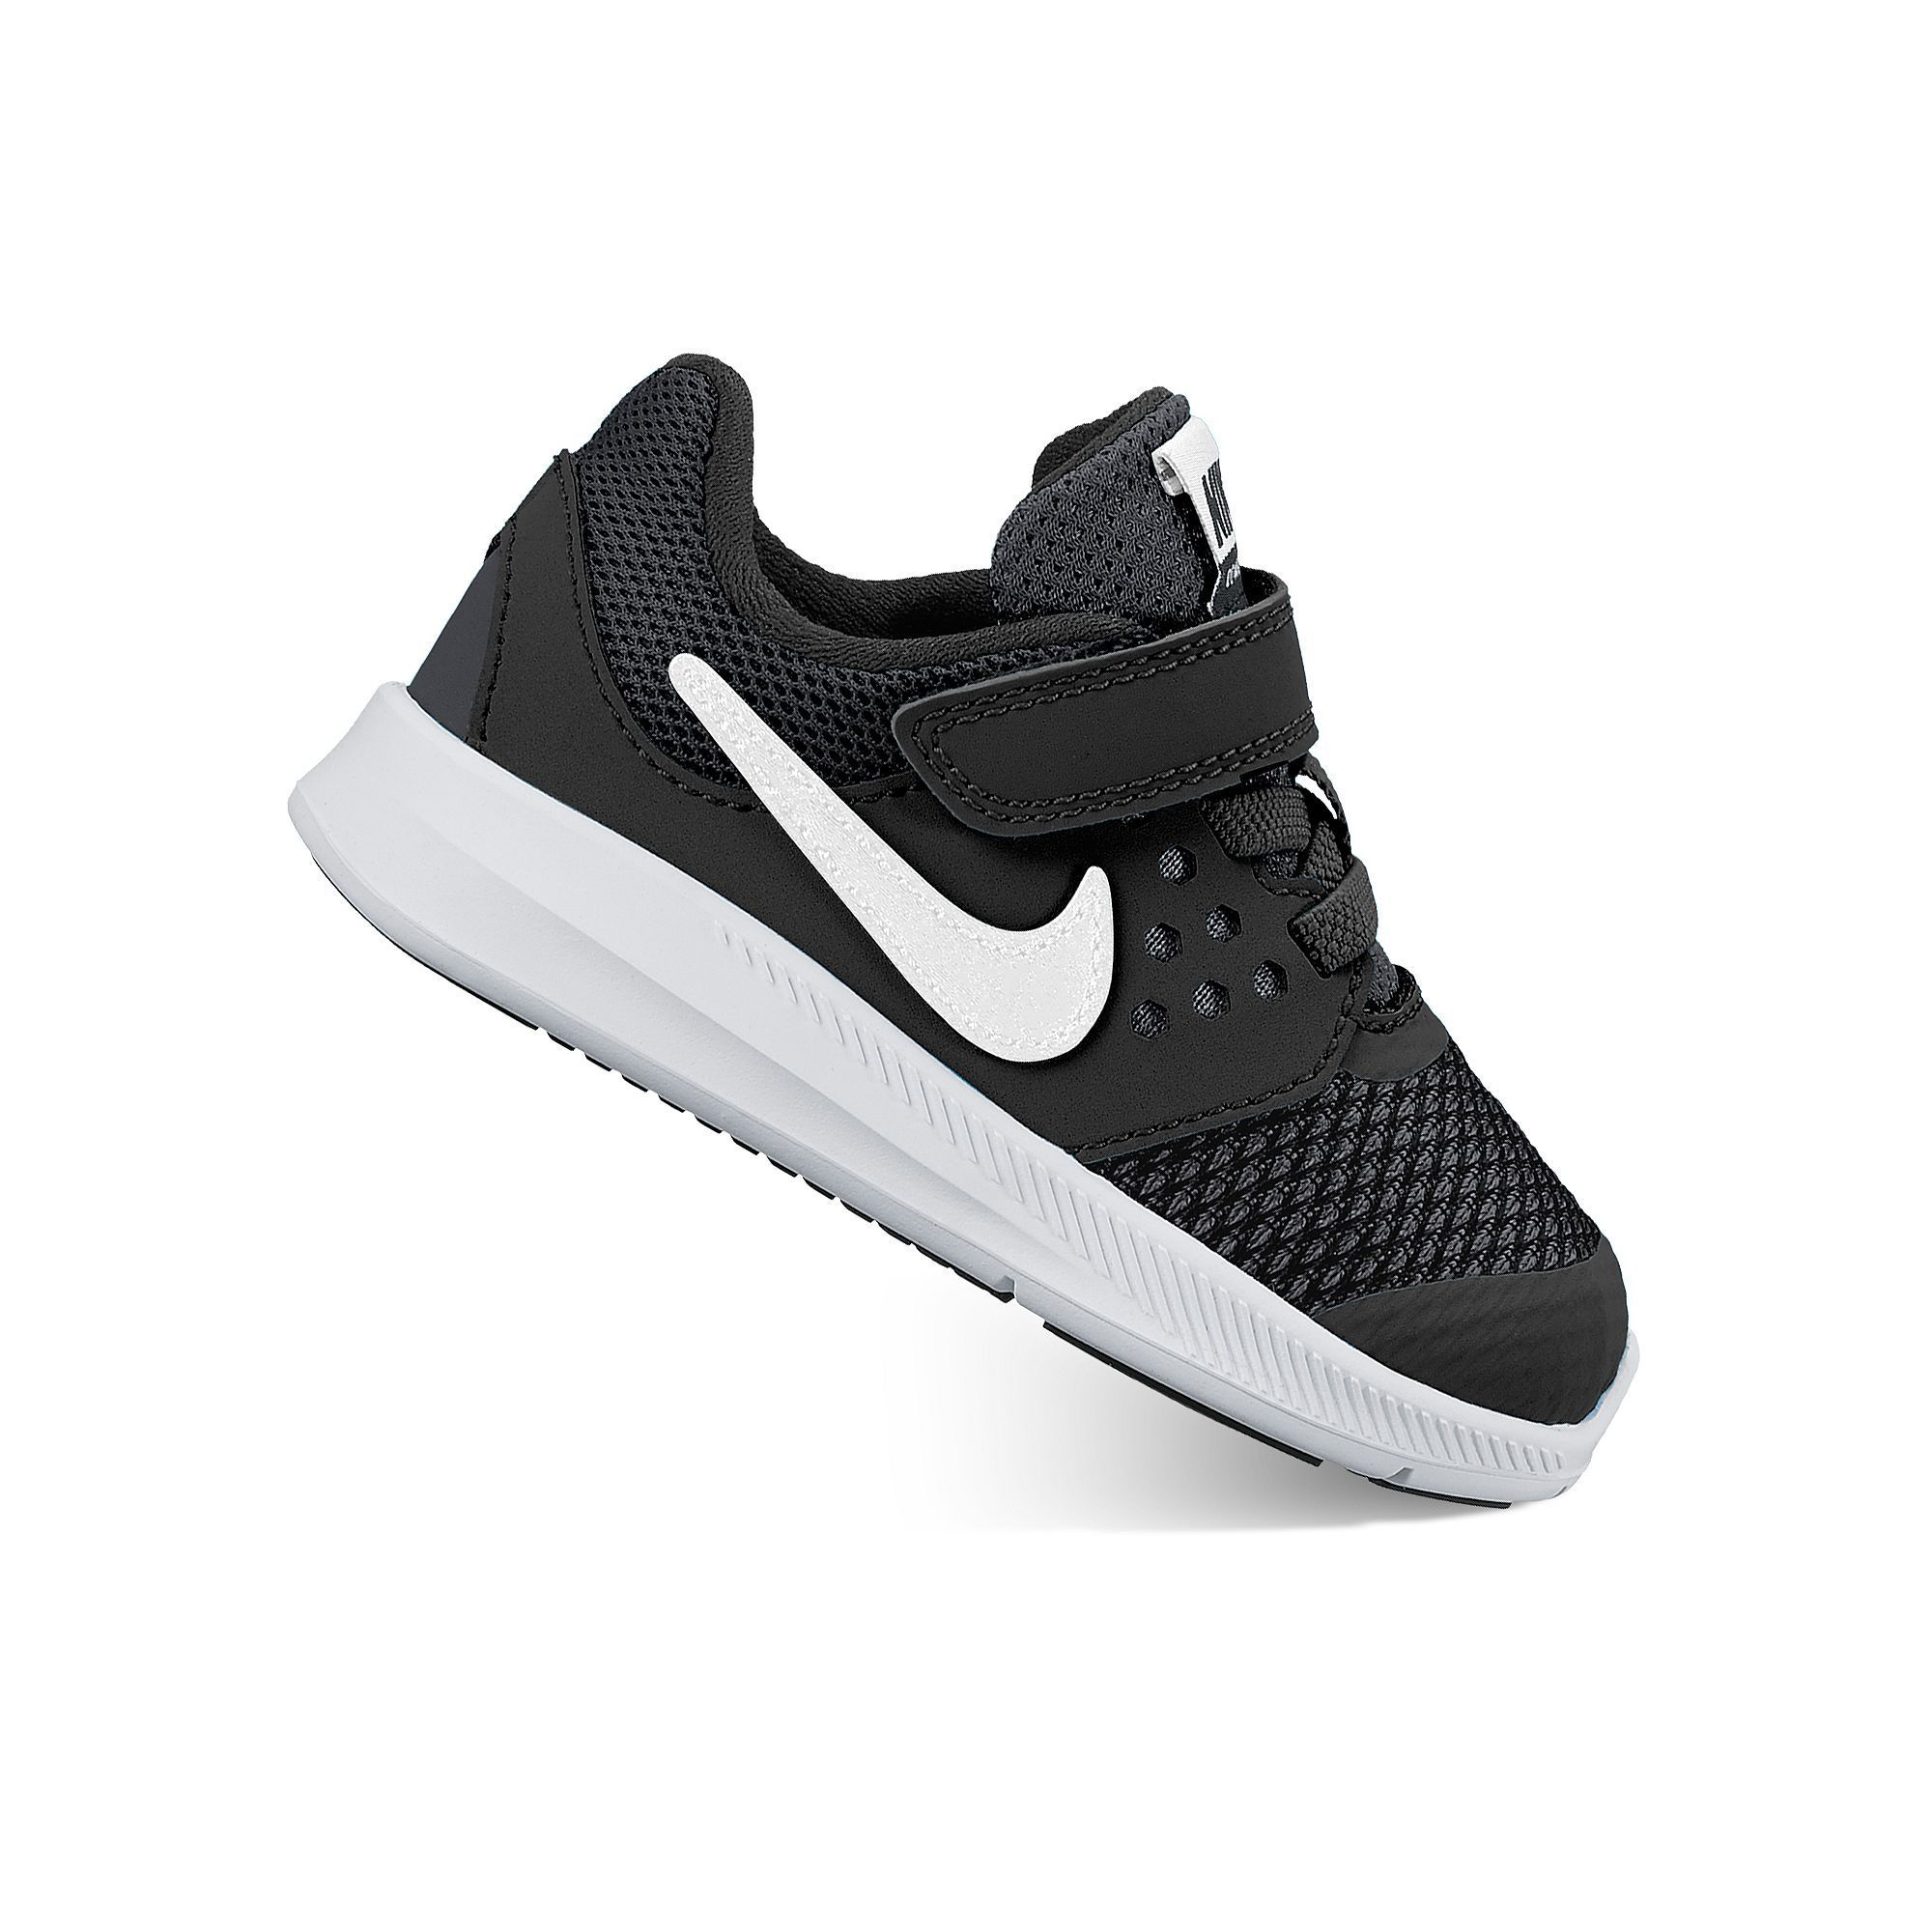 Toddler Boys' Shoes | Nike shoes girls